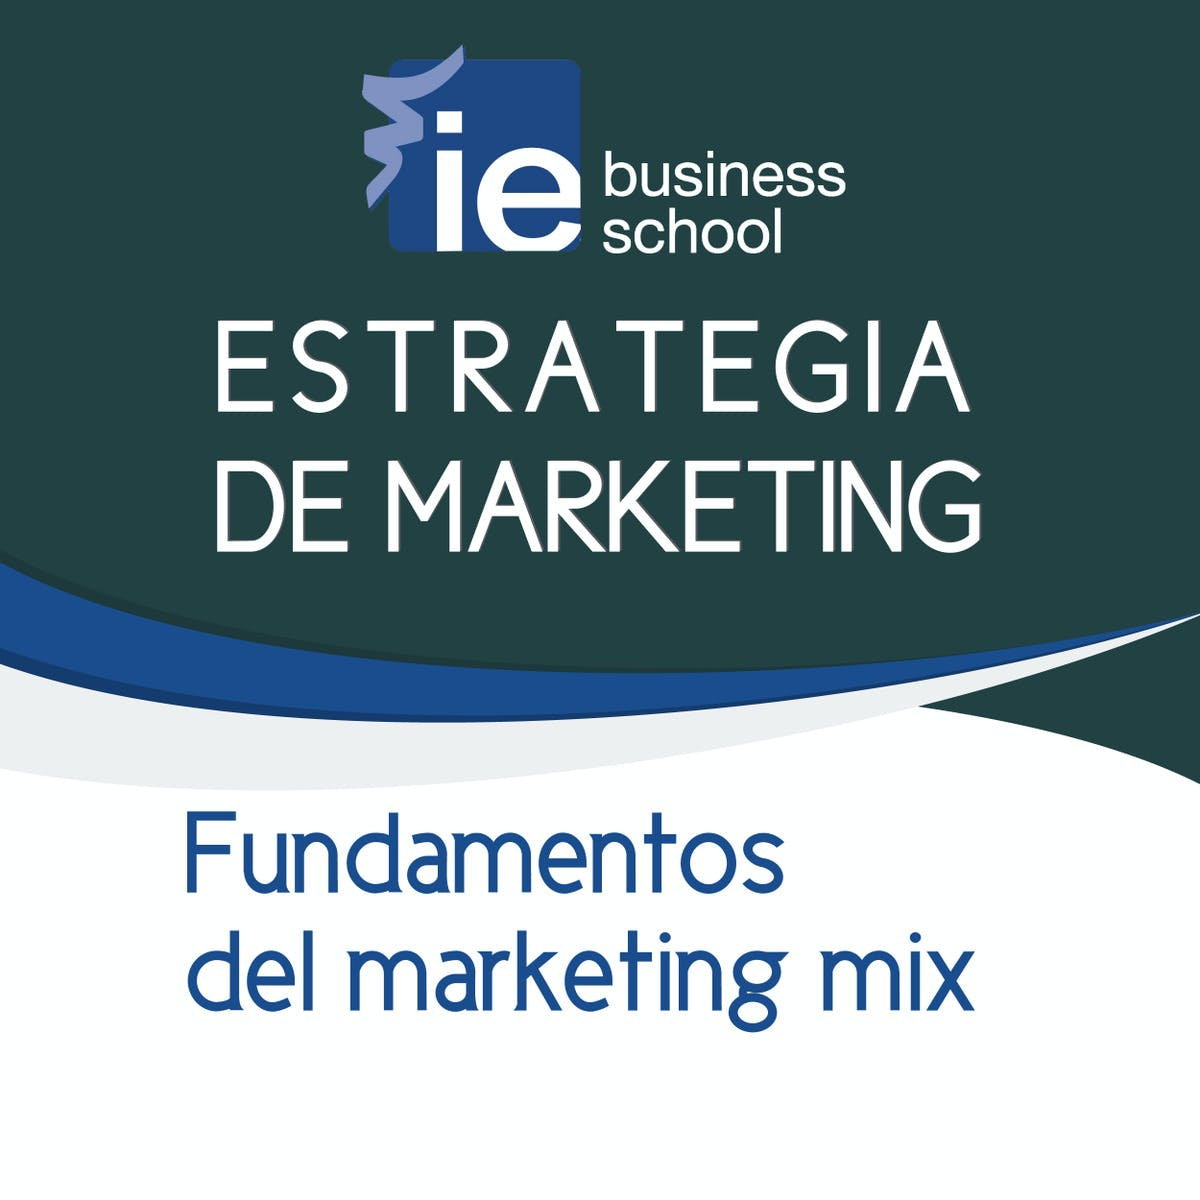 Fundamentos del marketing mix